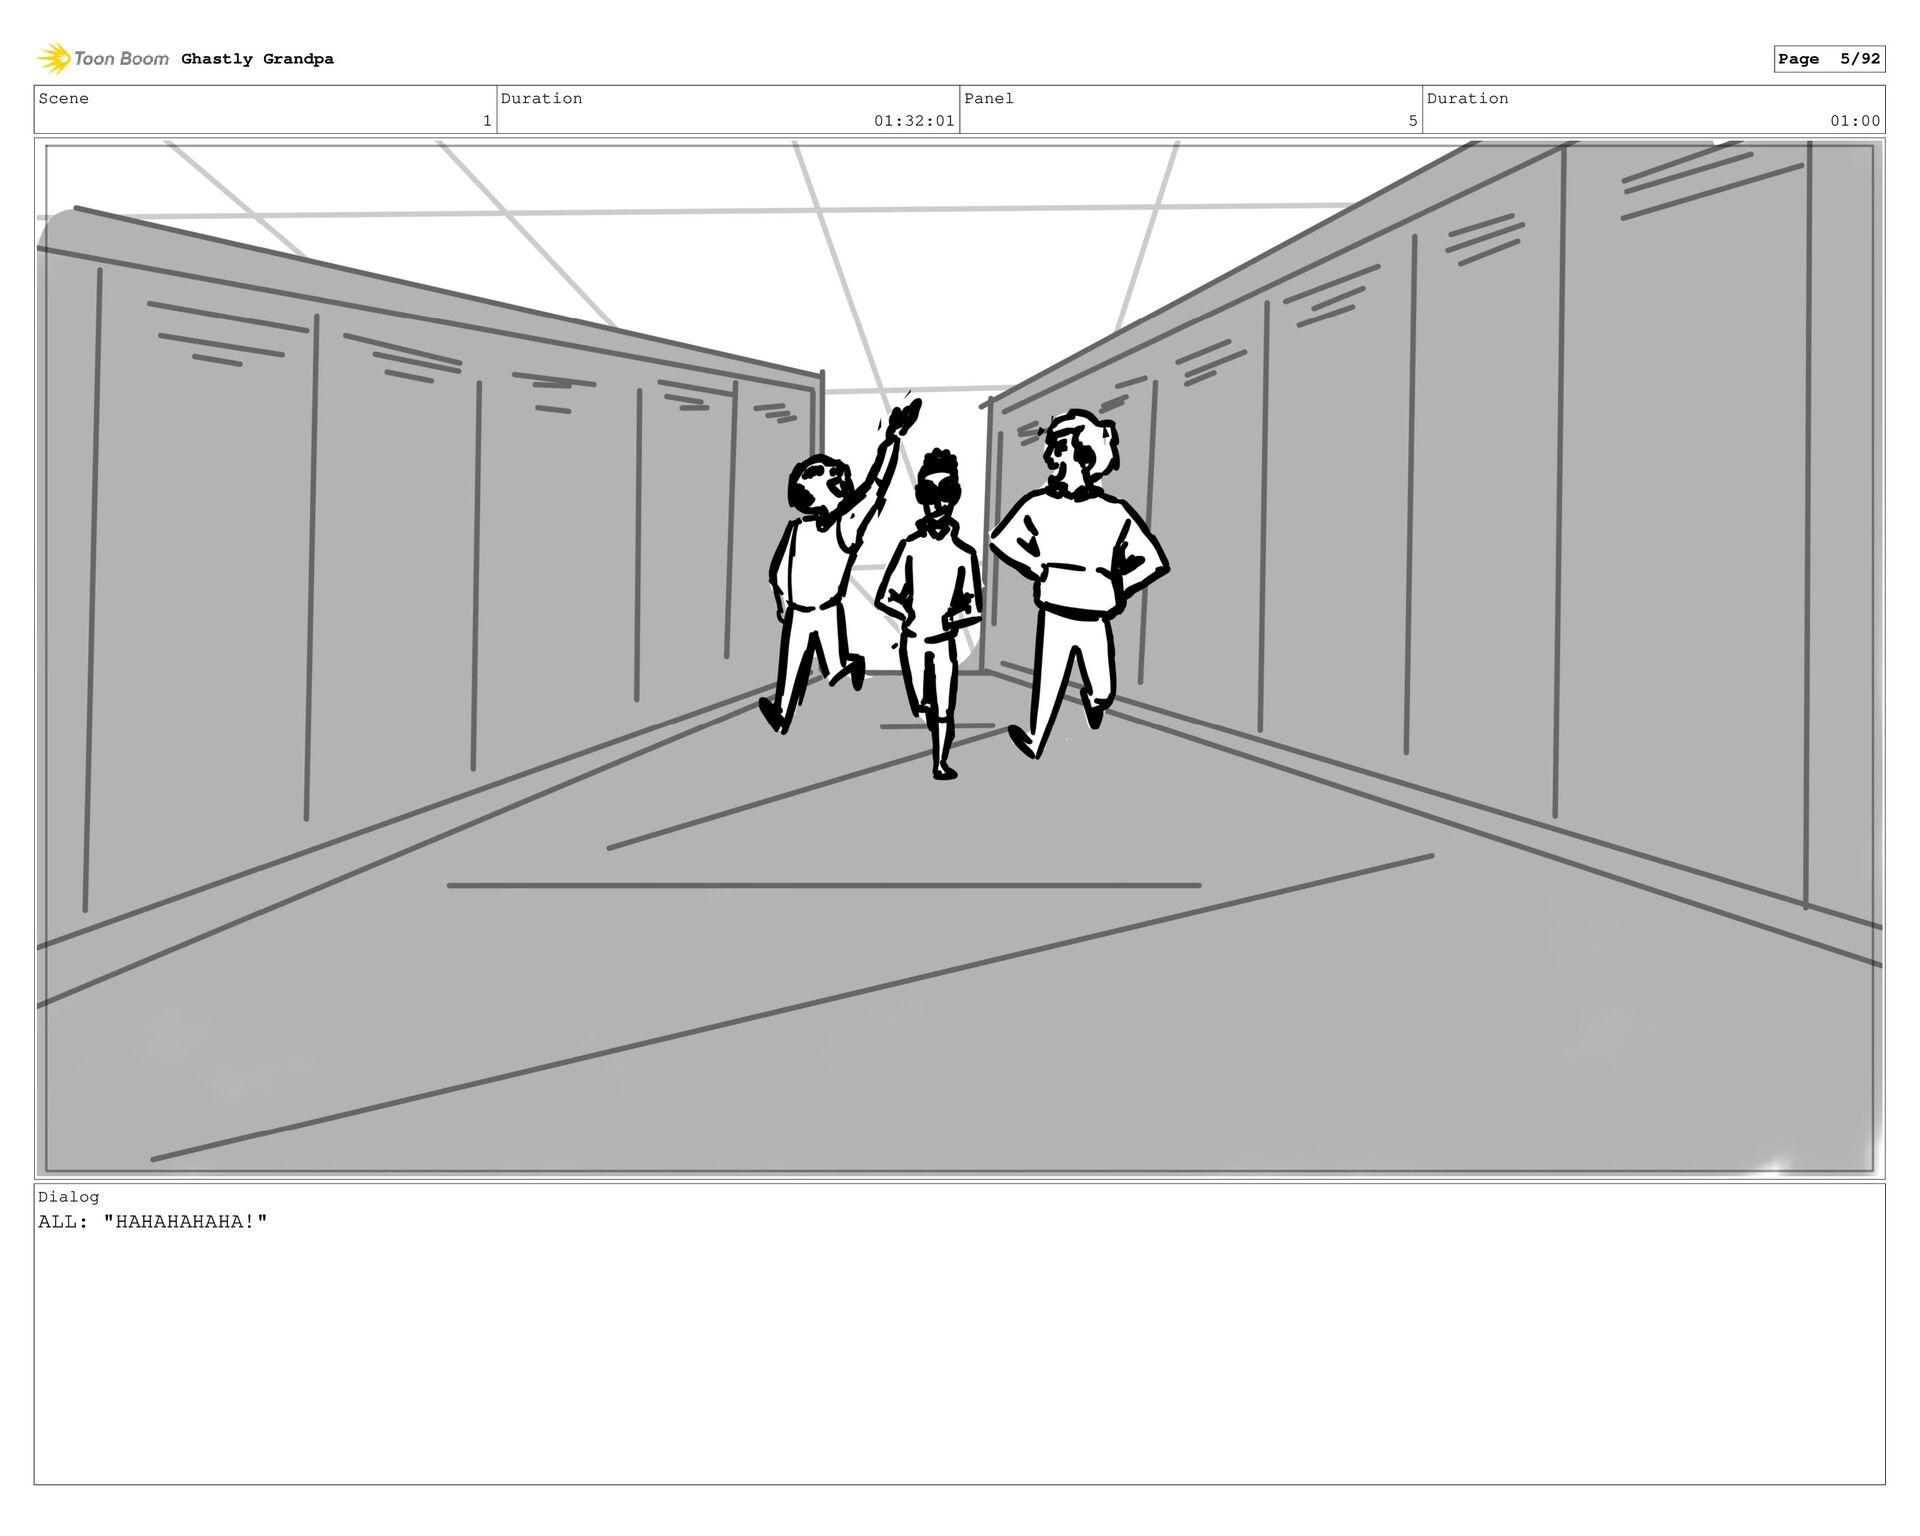 Scene 1 Duration 01:27:01 Panel 4 Duration 01:0...